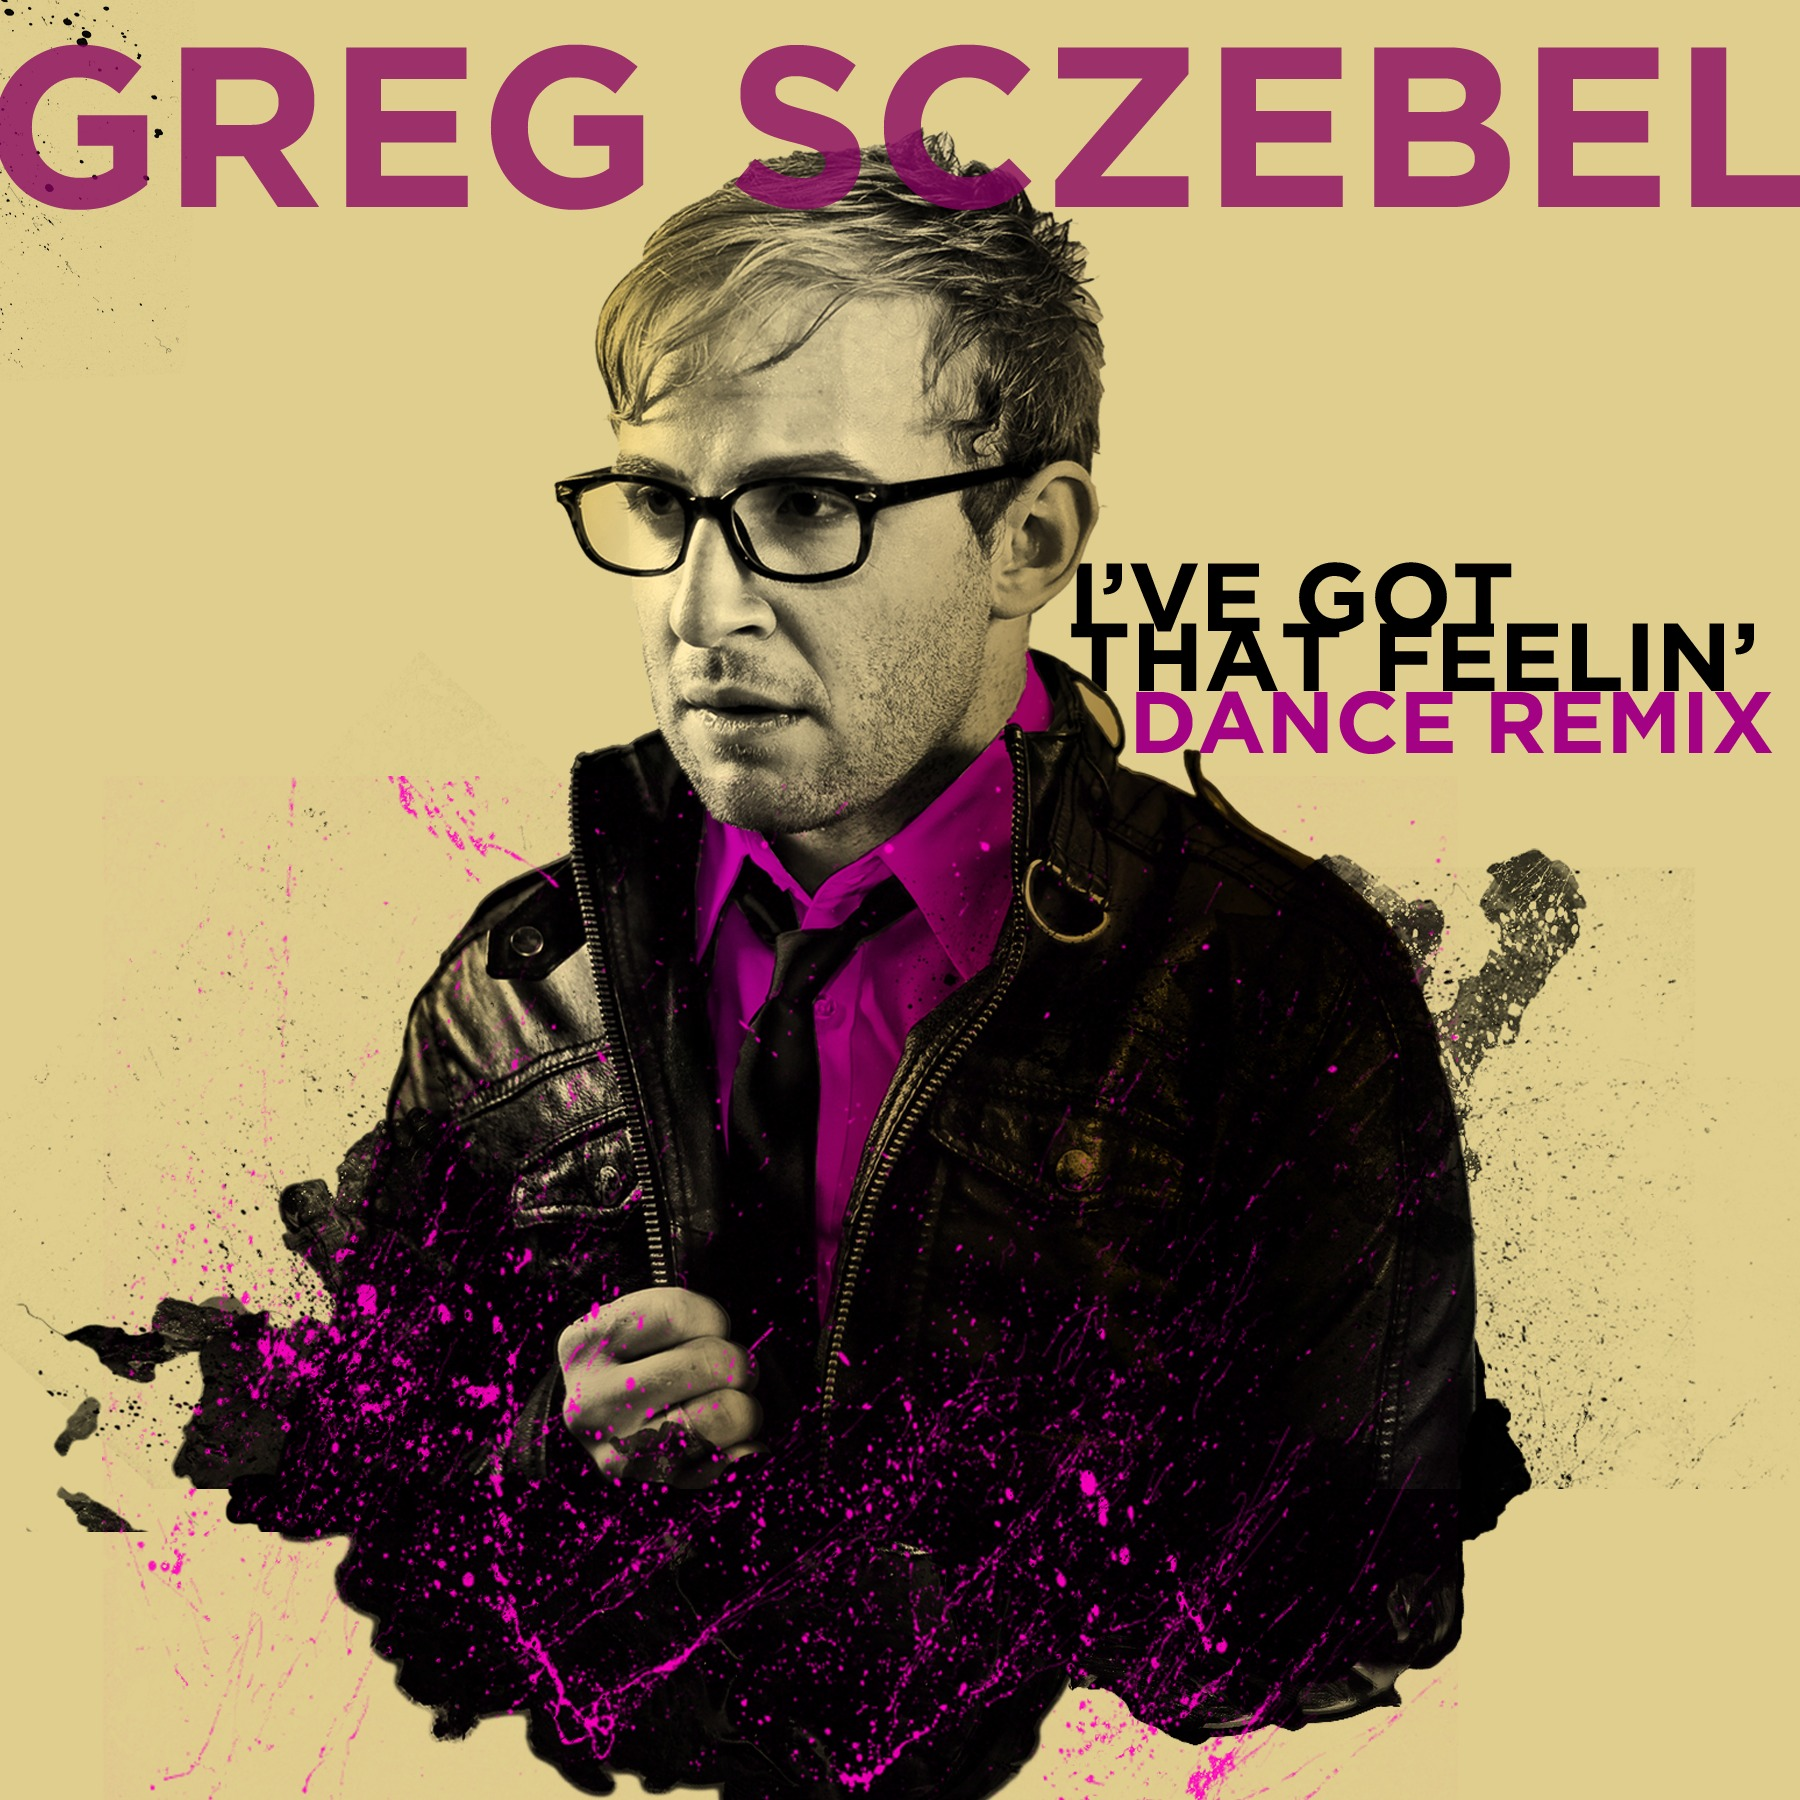 Greg Sczebel - I've Got That Feelin' Remix